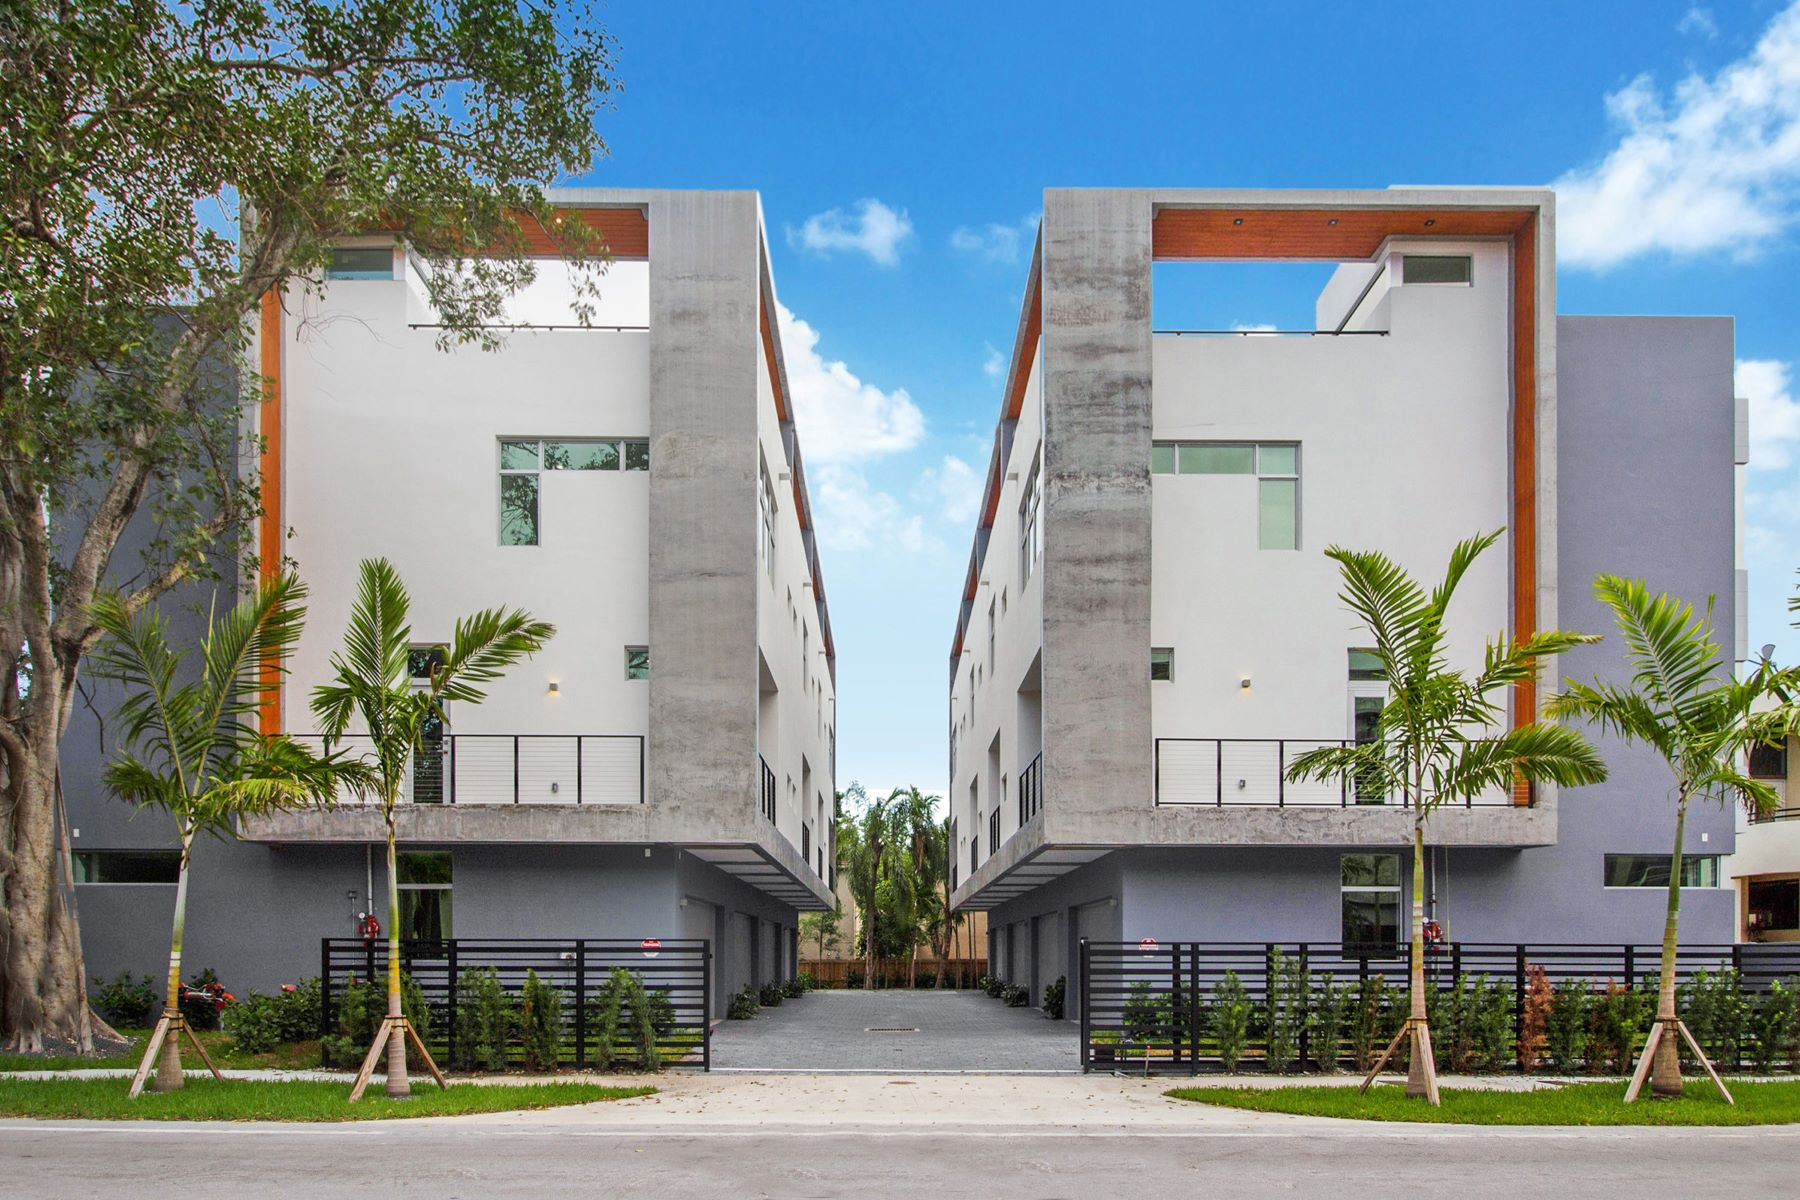 townhouses 为 销售 在 2926 Bird Avenue 1 椰树林, 佛罗里达州 33133 美国